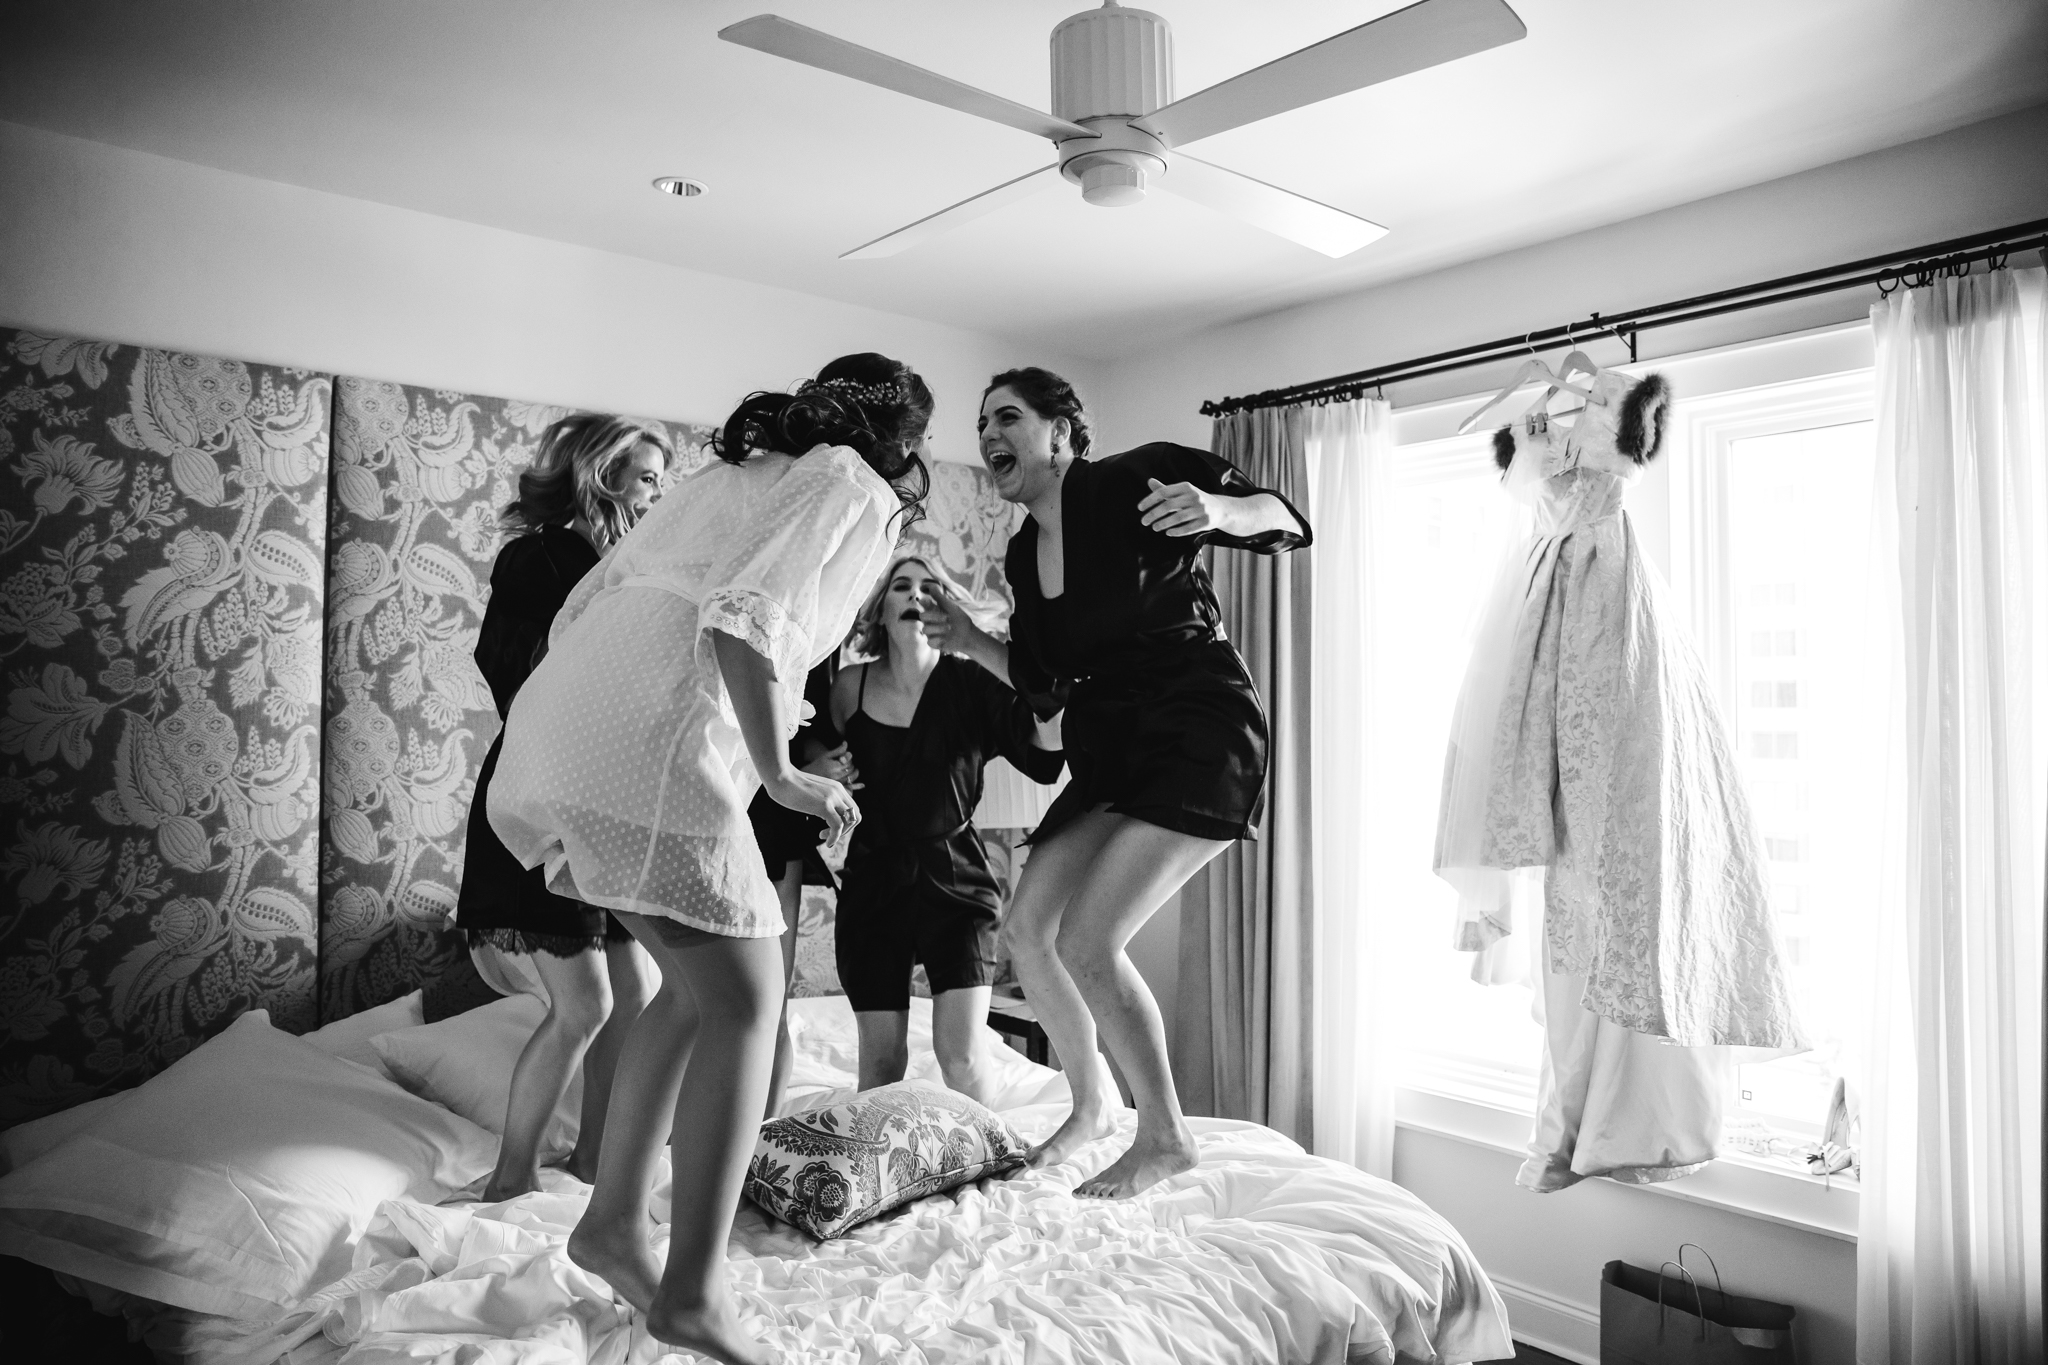 downtown-new-orleans-wedding-international-hotel (5 of 21).jpg